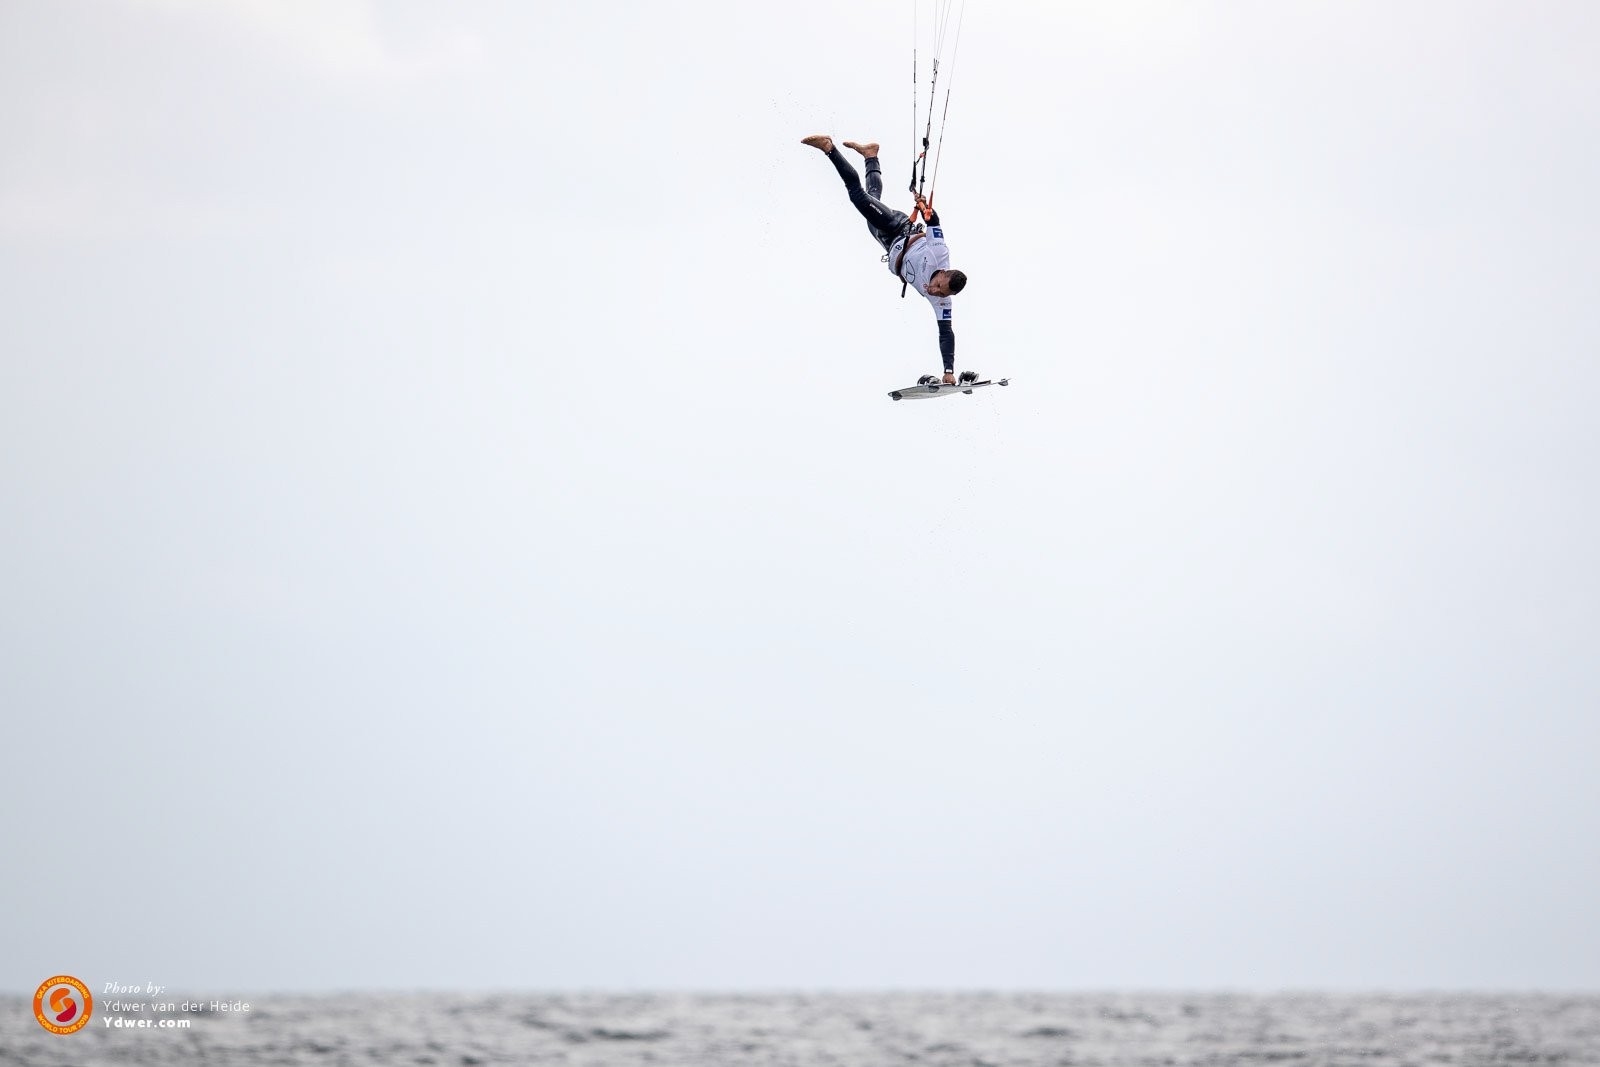 GKA Kiteboarding World Tour Air Games 4